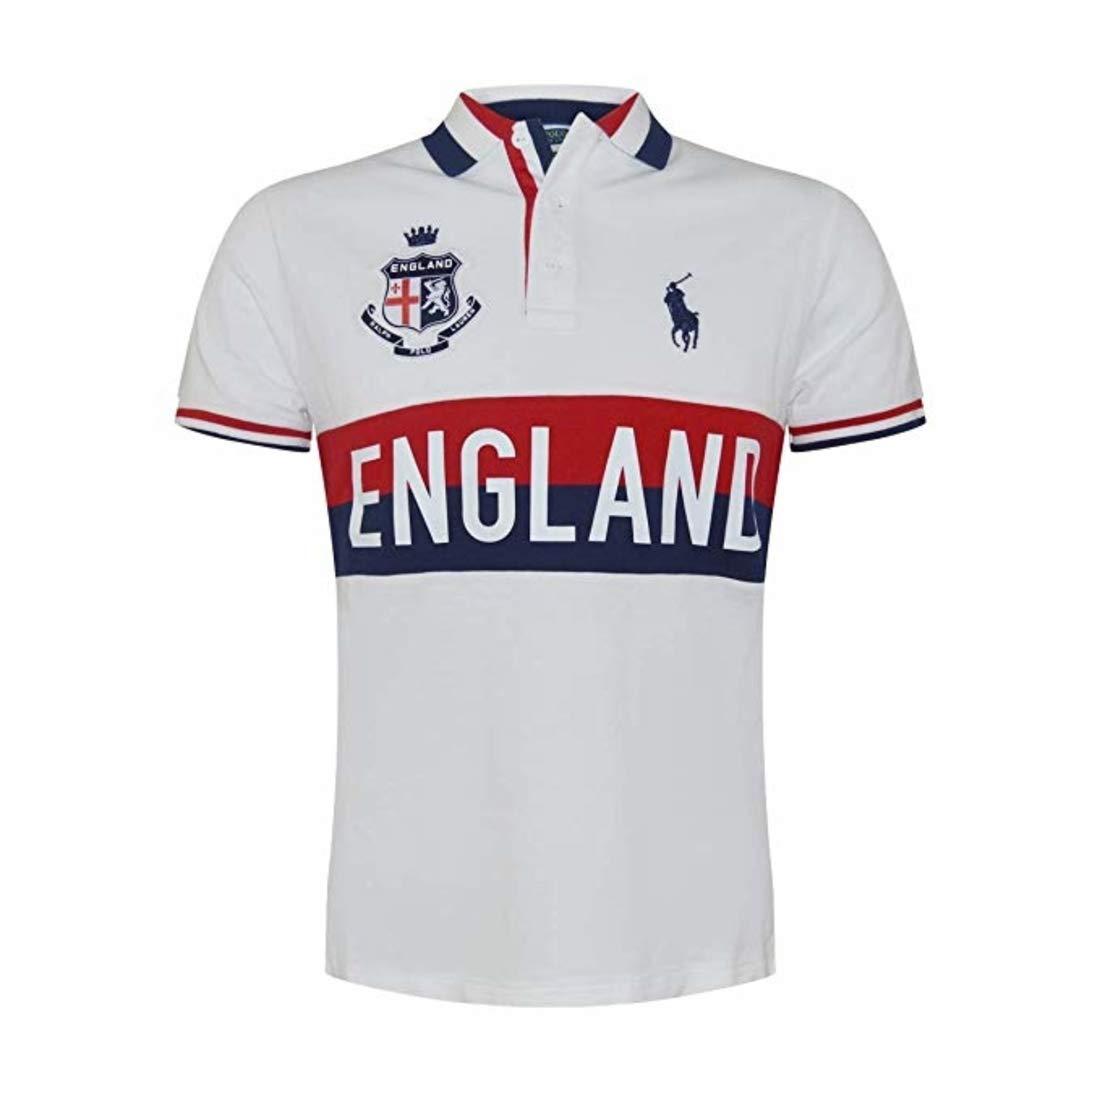 Shirtxx Mens LargeWhiteredblue Mesh Lauren Polo Fit Pony Custom Country England Big Ralph NPvn0Owym8